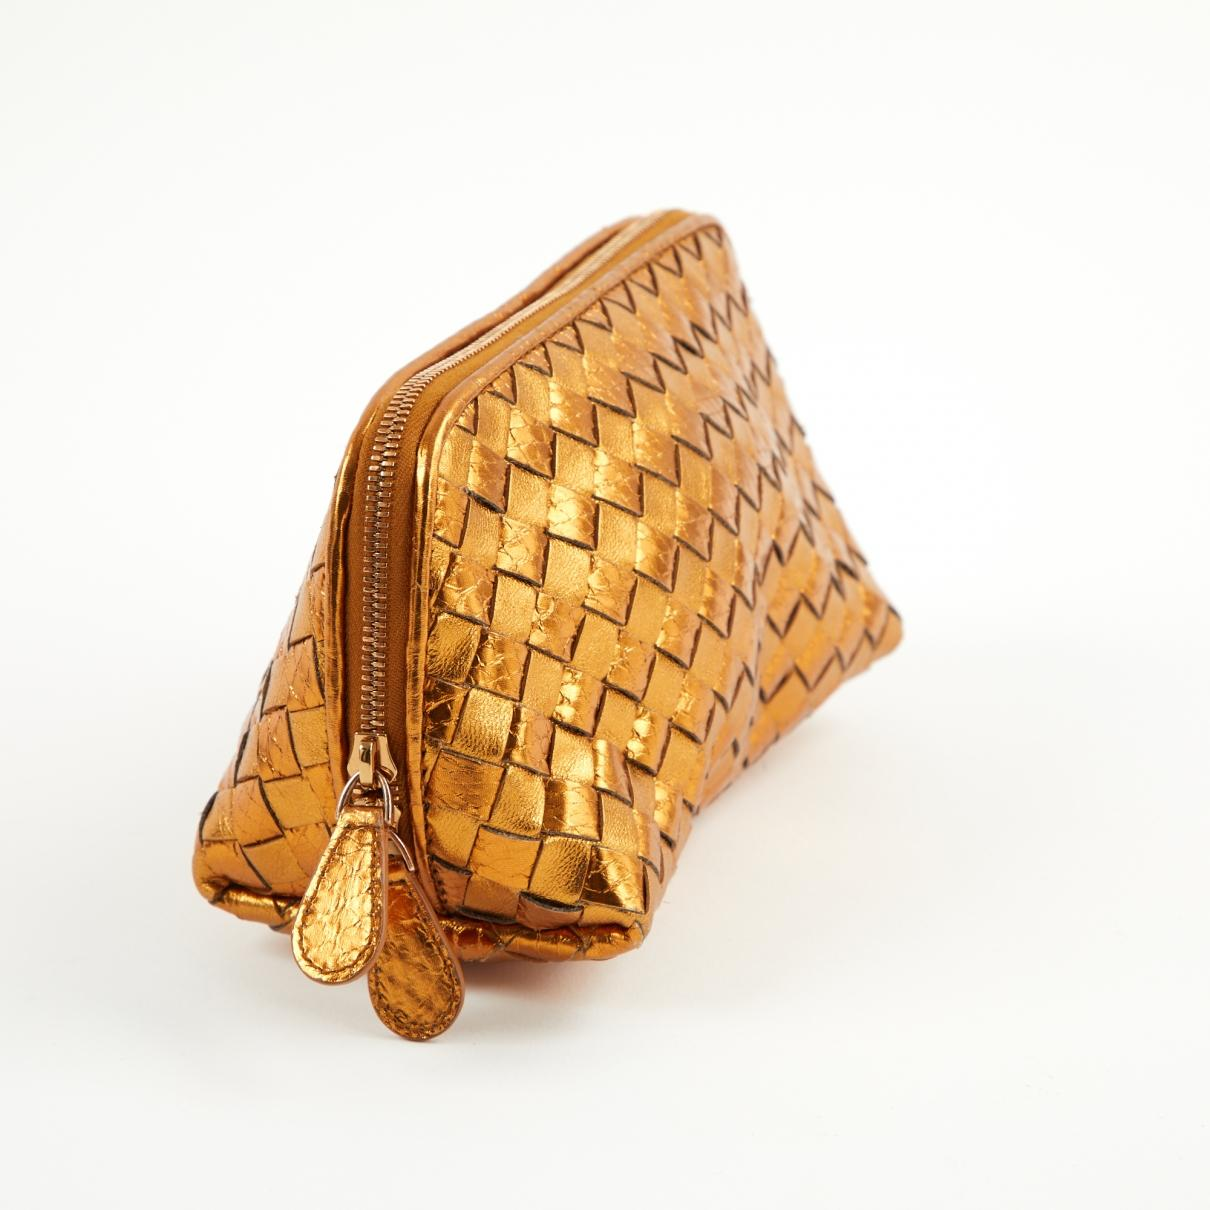 eb7364ba16 Bottega Veneta - Metallic Pre-owned Gold Leather Clutch Bags - Lyst. View  fullscreen